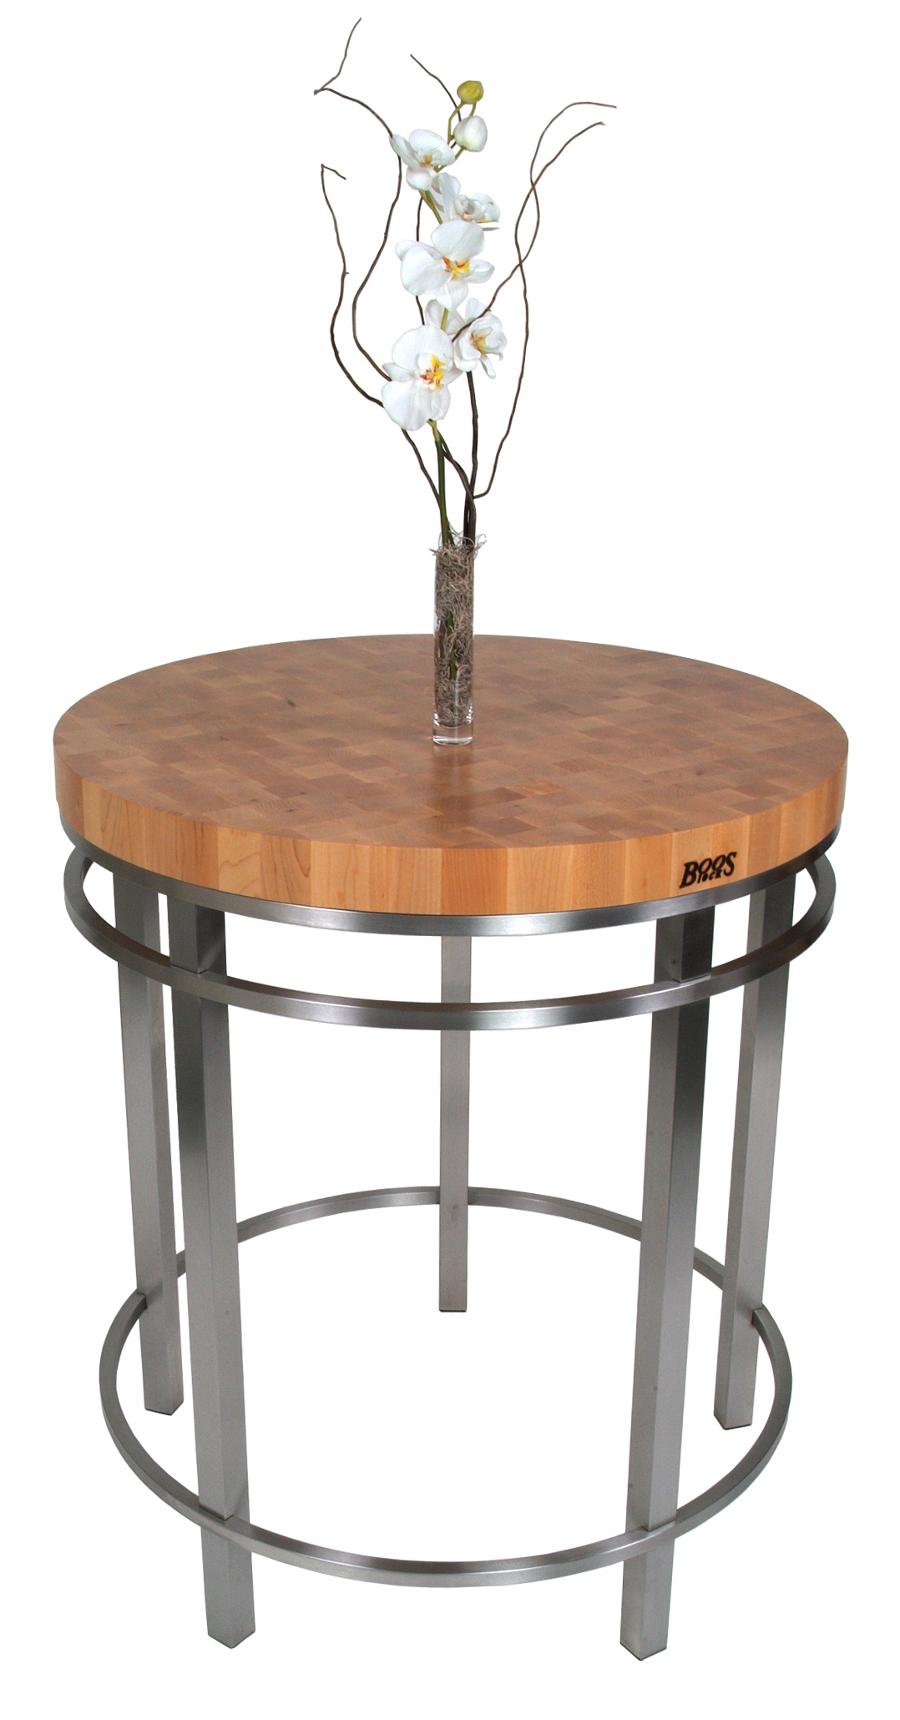 John Boos Metro Oasis Round Table Wood-Steel Table